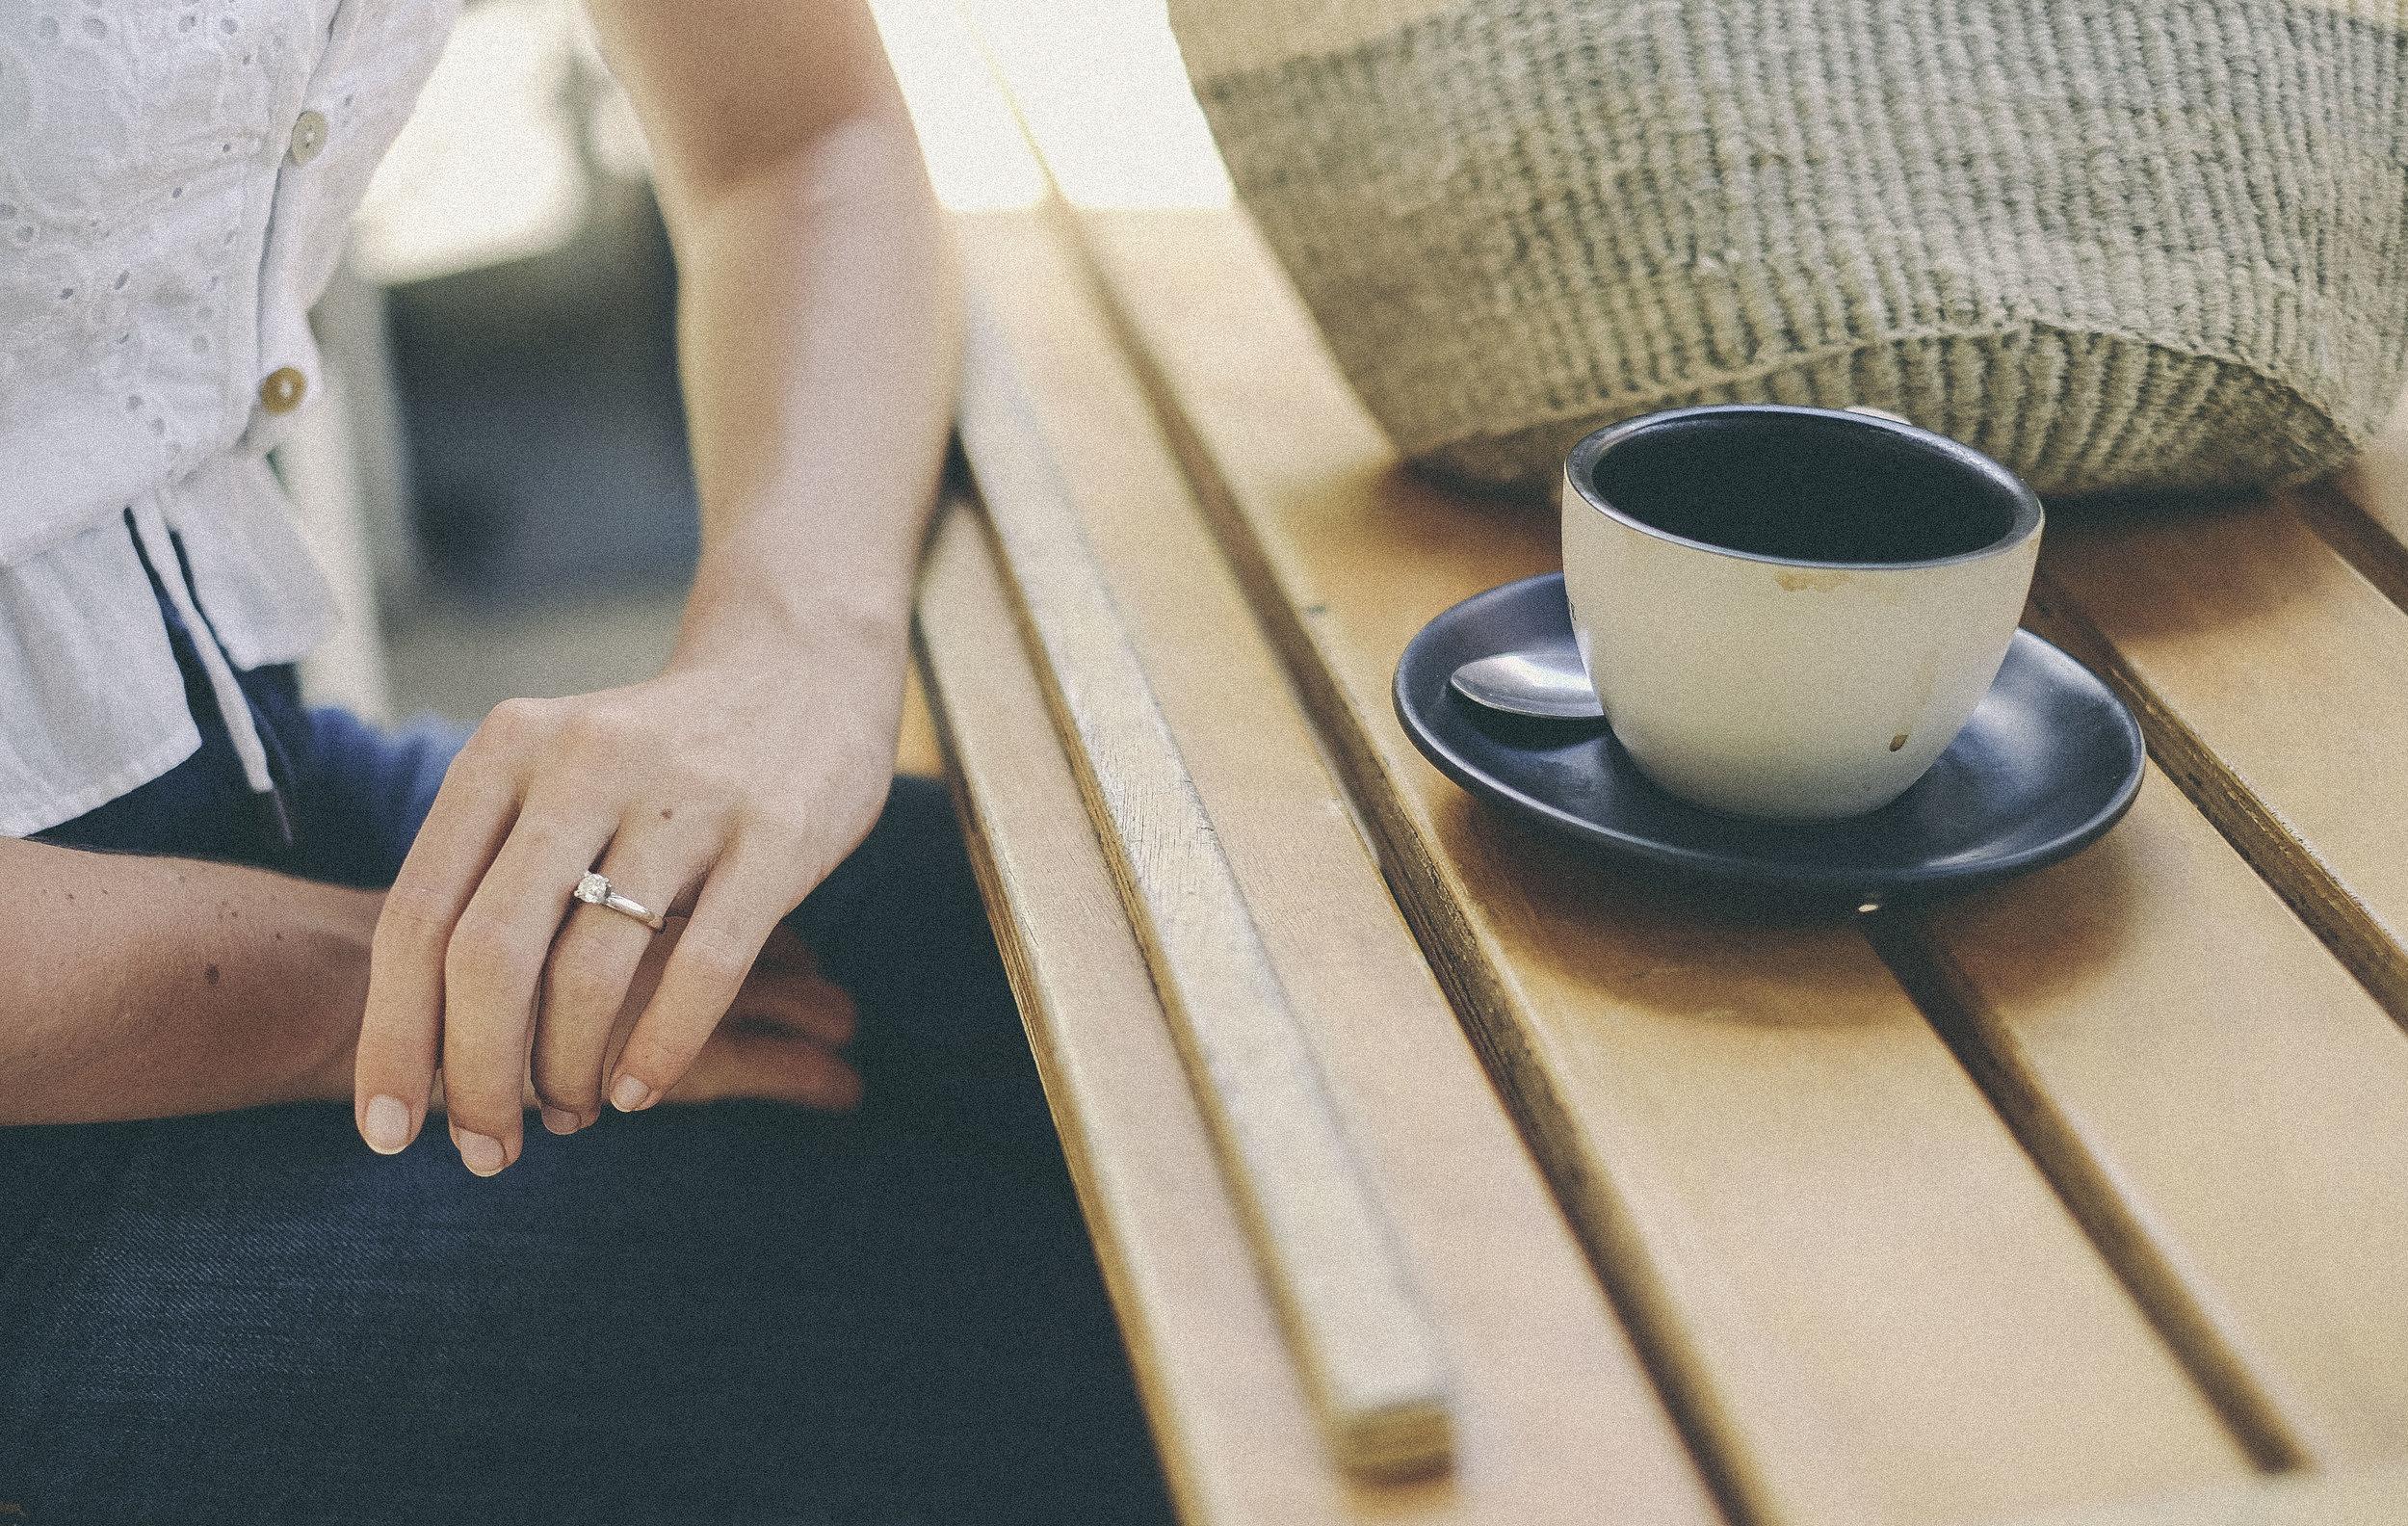 #COFFEE www.derrive.com